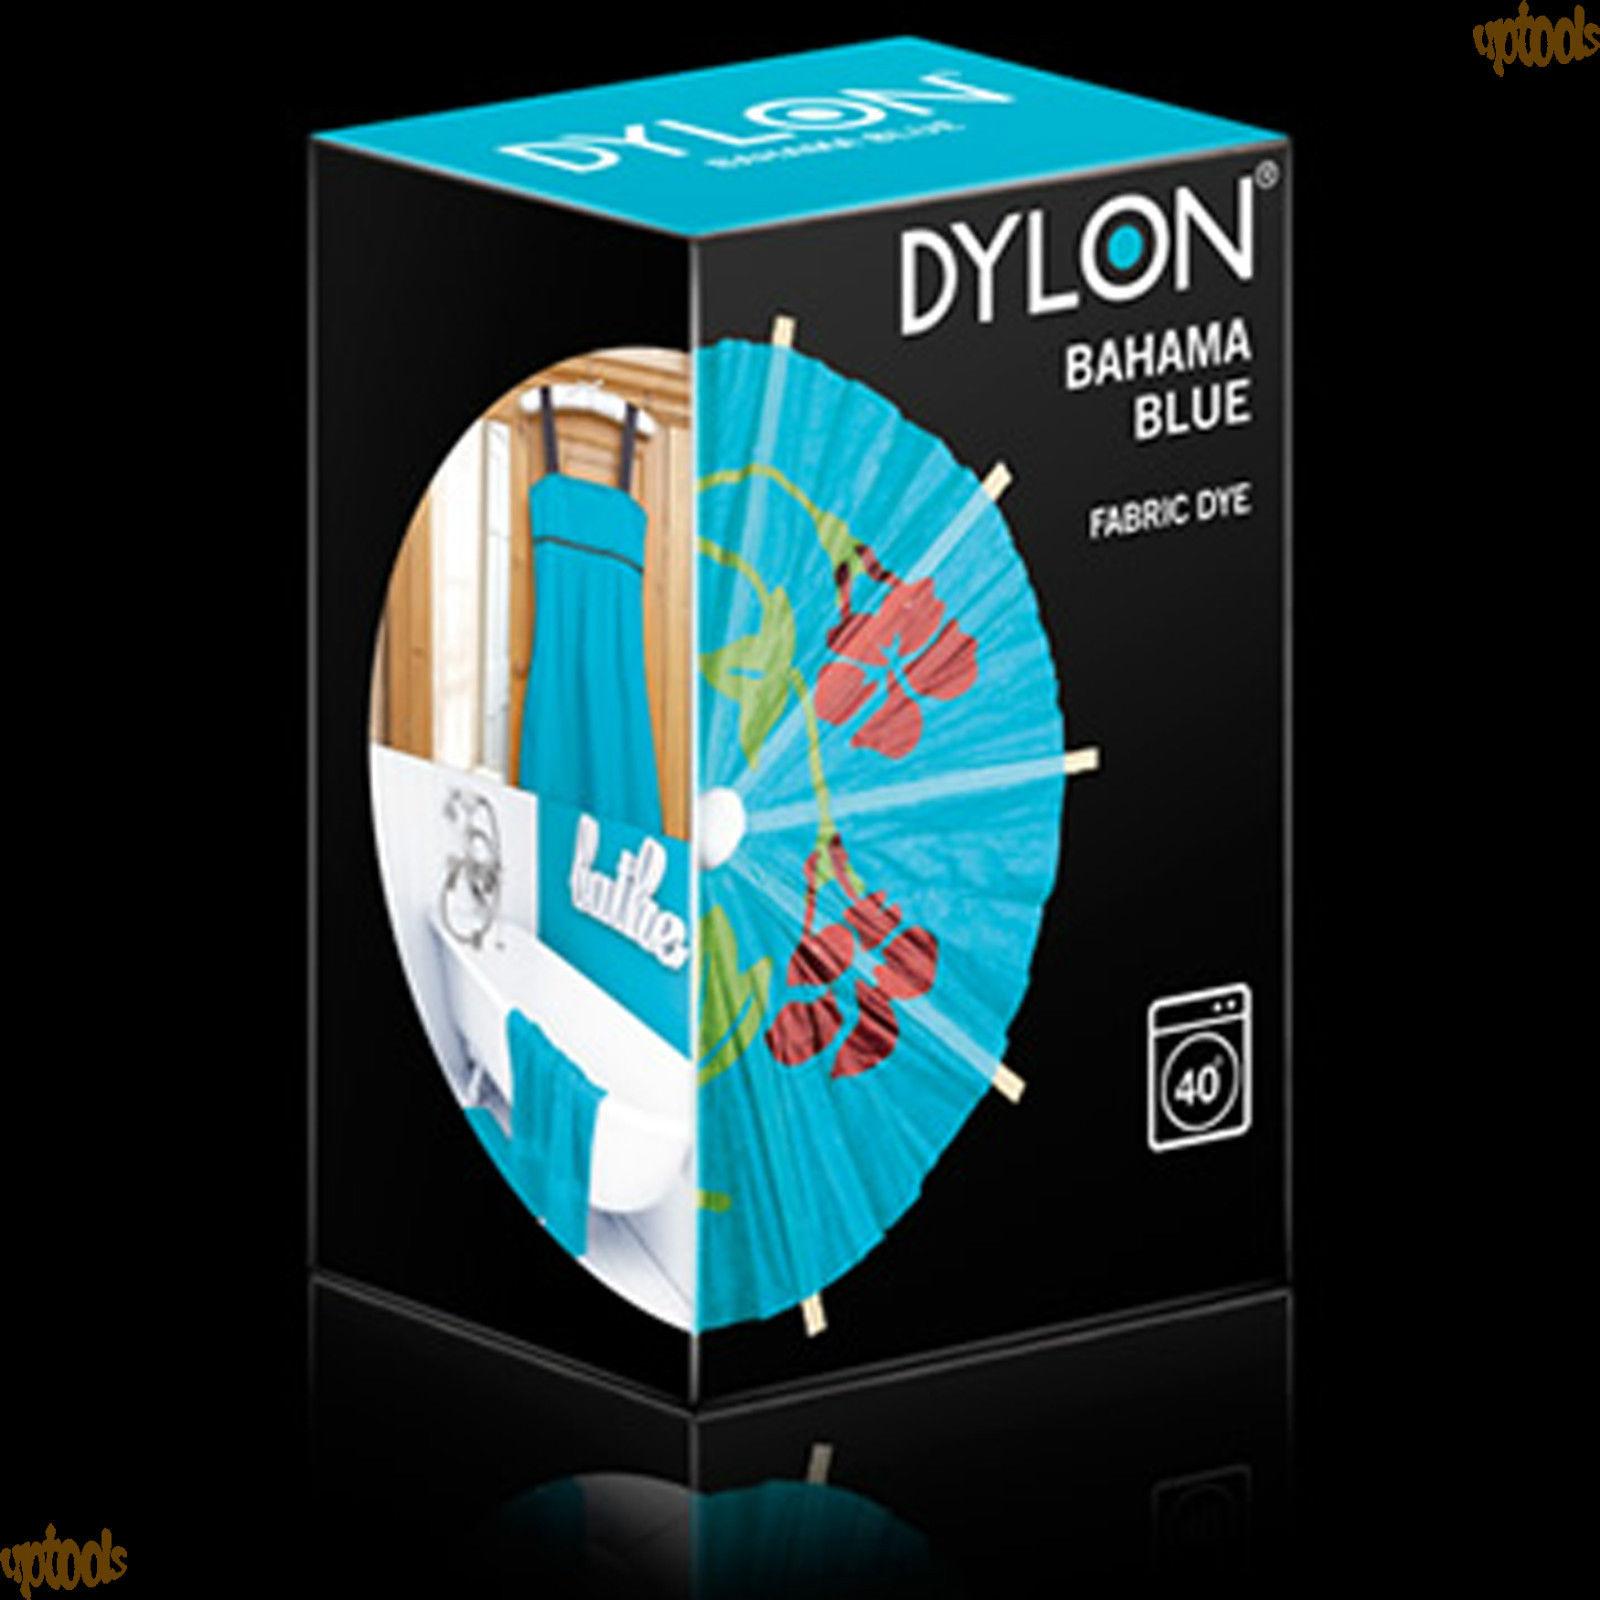 DYLON Machine Wash Fabric Clothes Dye 200g - Brand New In ...